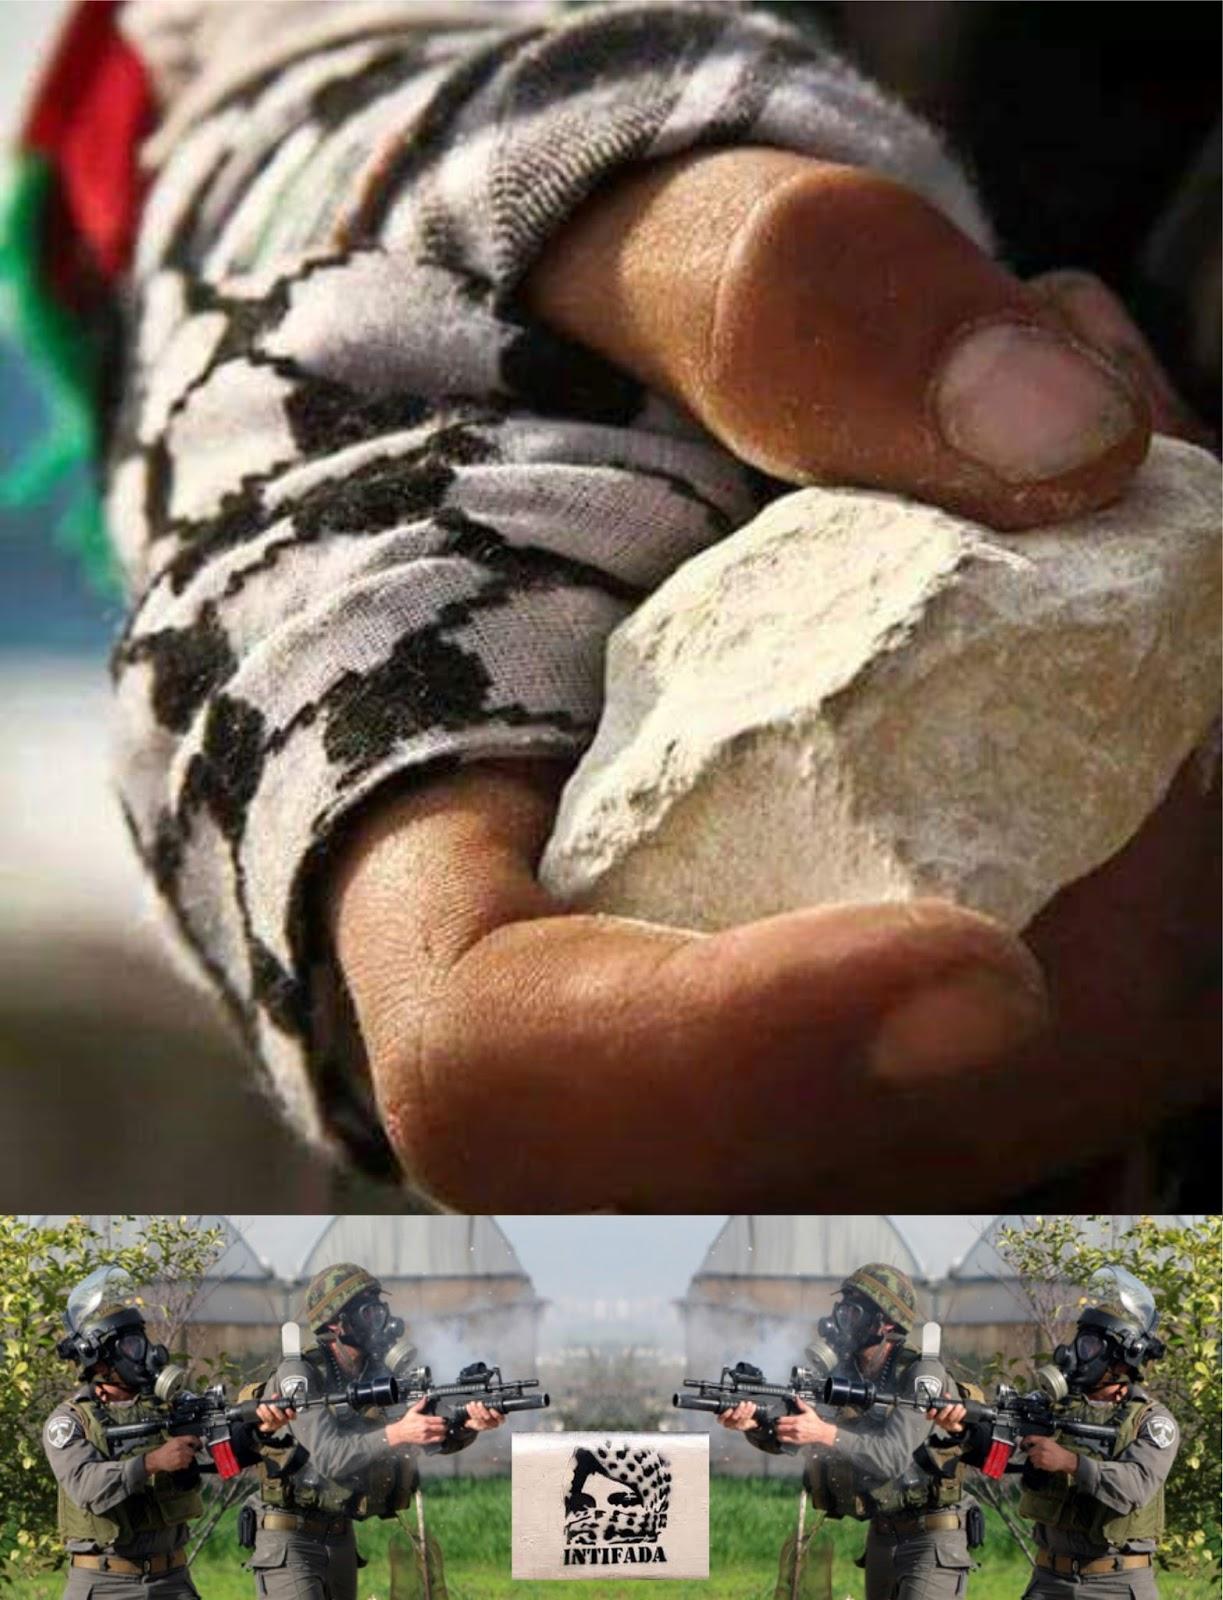 http://3.bp.blogspot.com/-Zh3SRhffPwk/ViDveioRTEI/AAAAAAAAHtk/fSVHSUdpK5g/s1600/Palestine%2BIntifada.%2BIsrael.%2BGirl%2Band%2BBoy.%2BOctober%2B2015.%2B%25231ab.jpg?SSImageQuality=Full